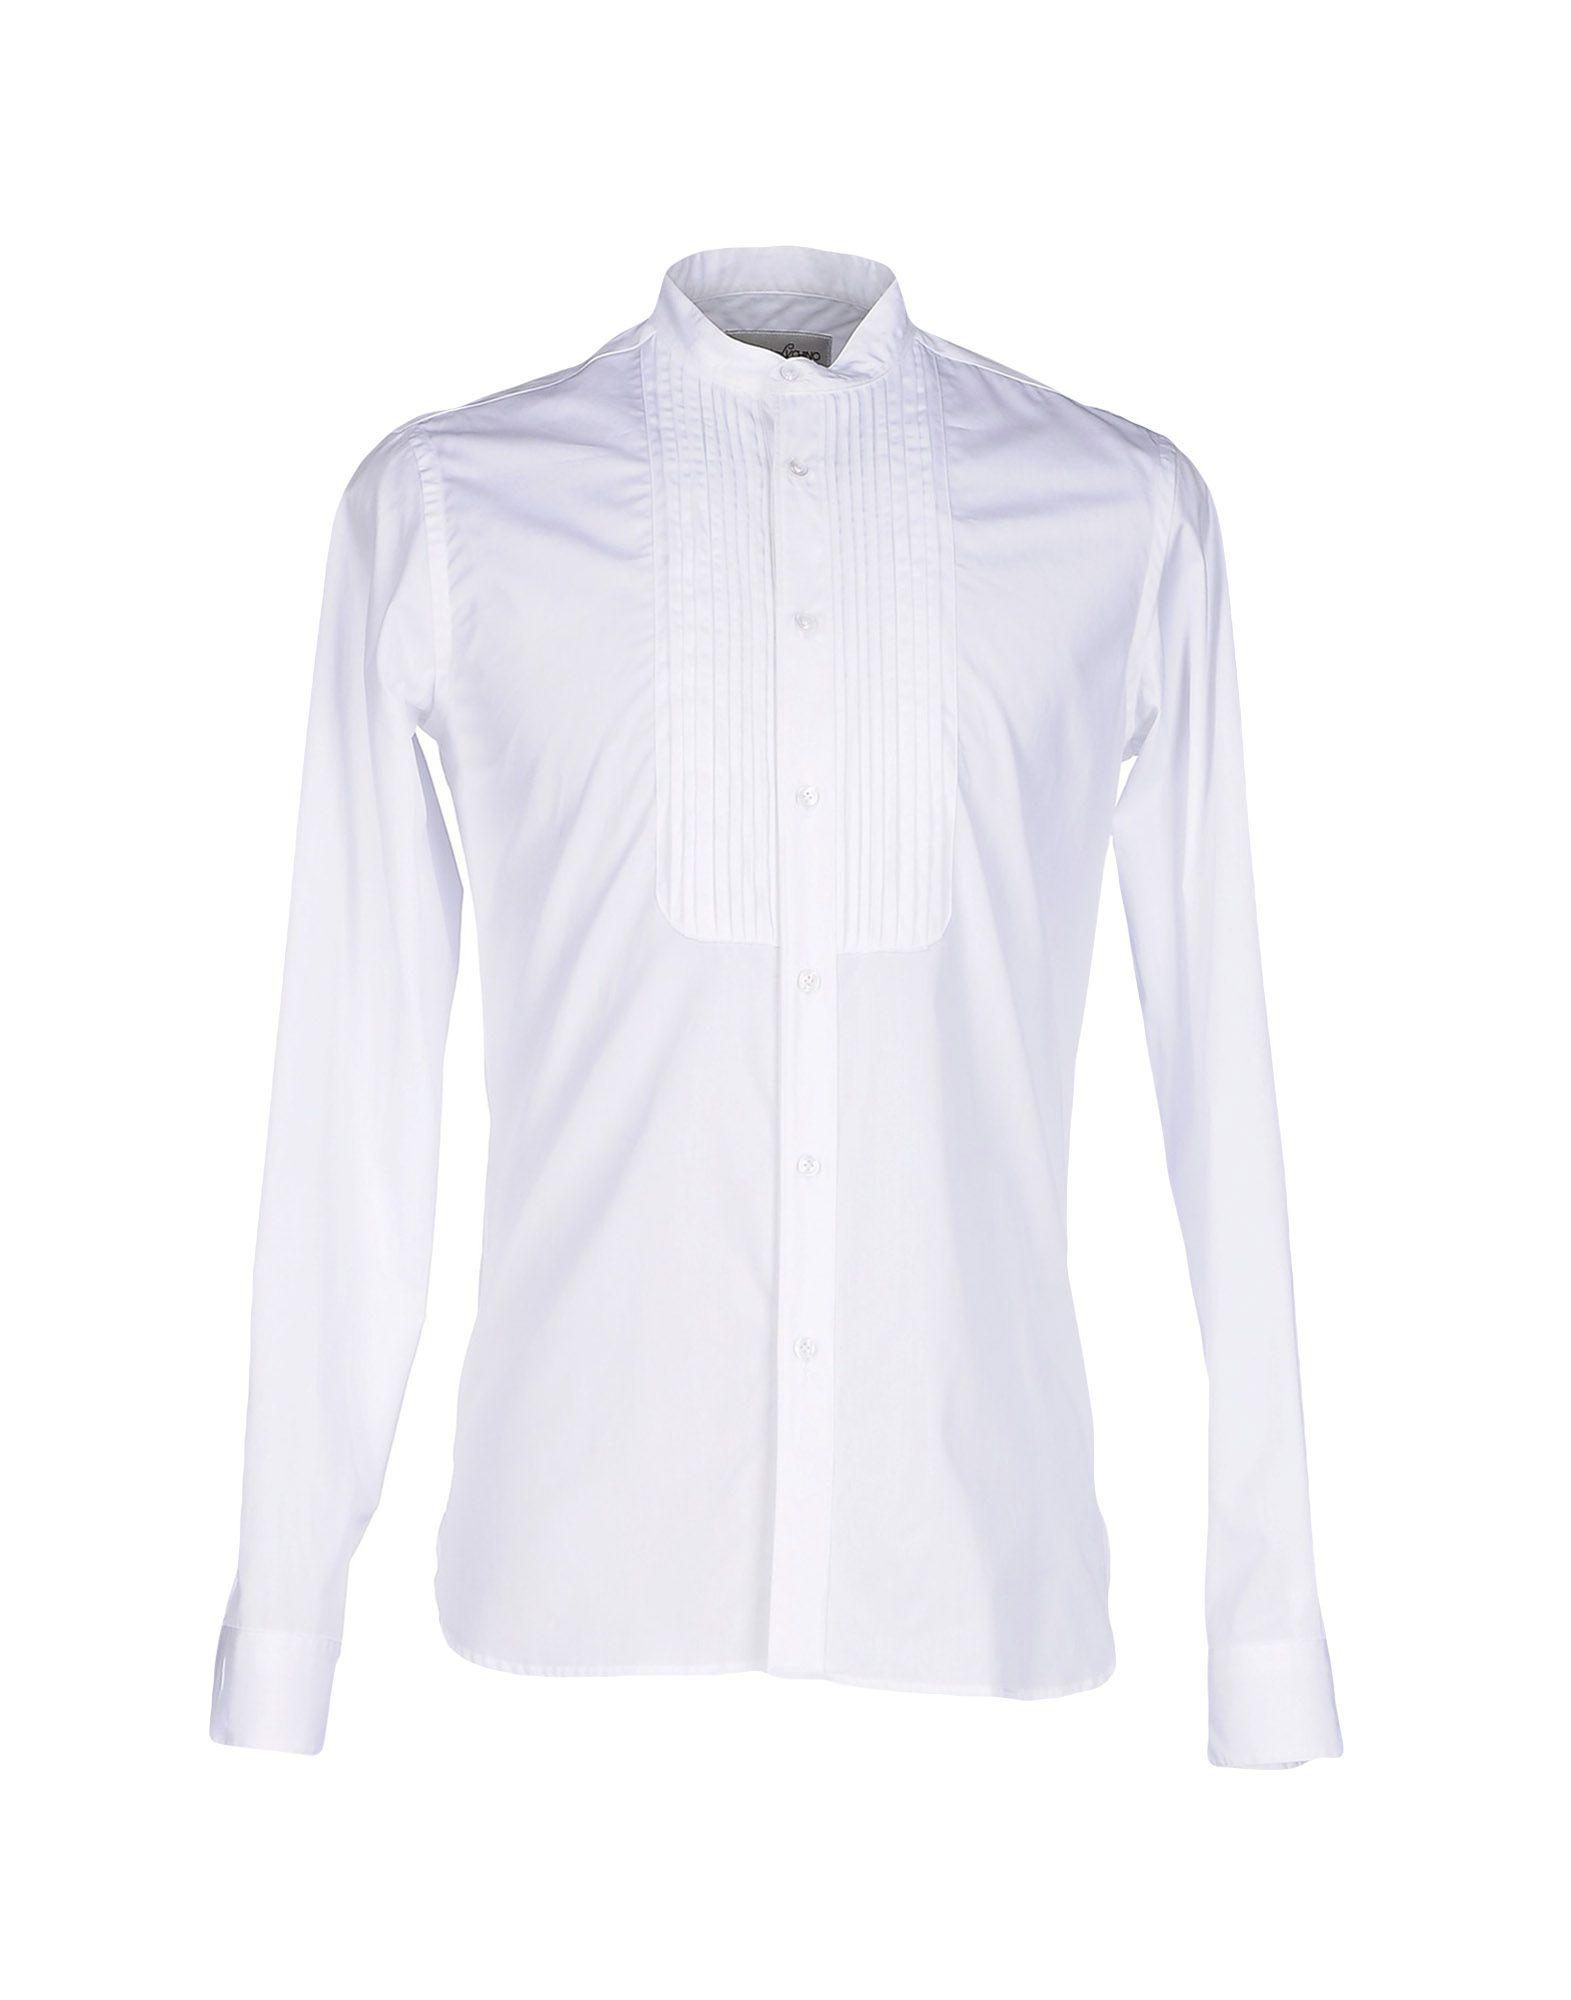 MAISON LVCHINO Solid Color Shirt in White